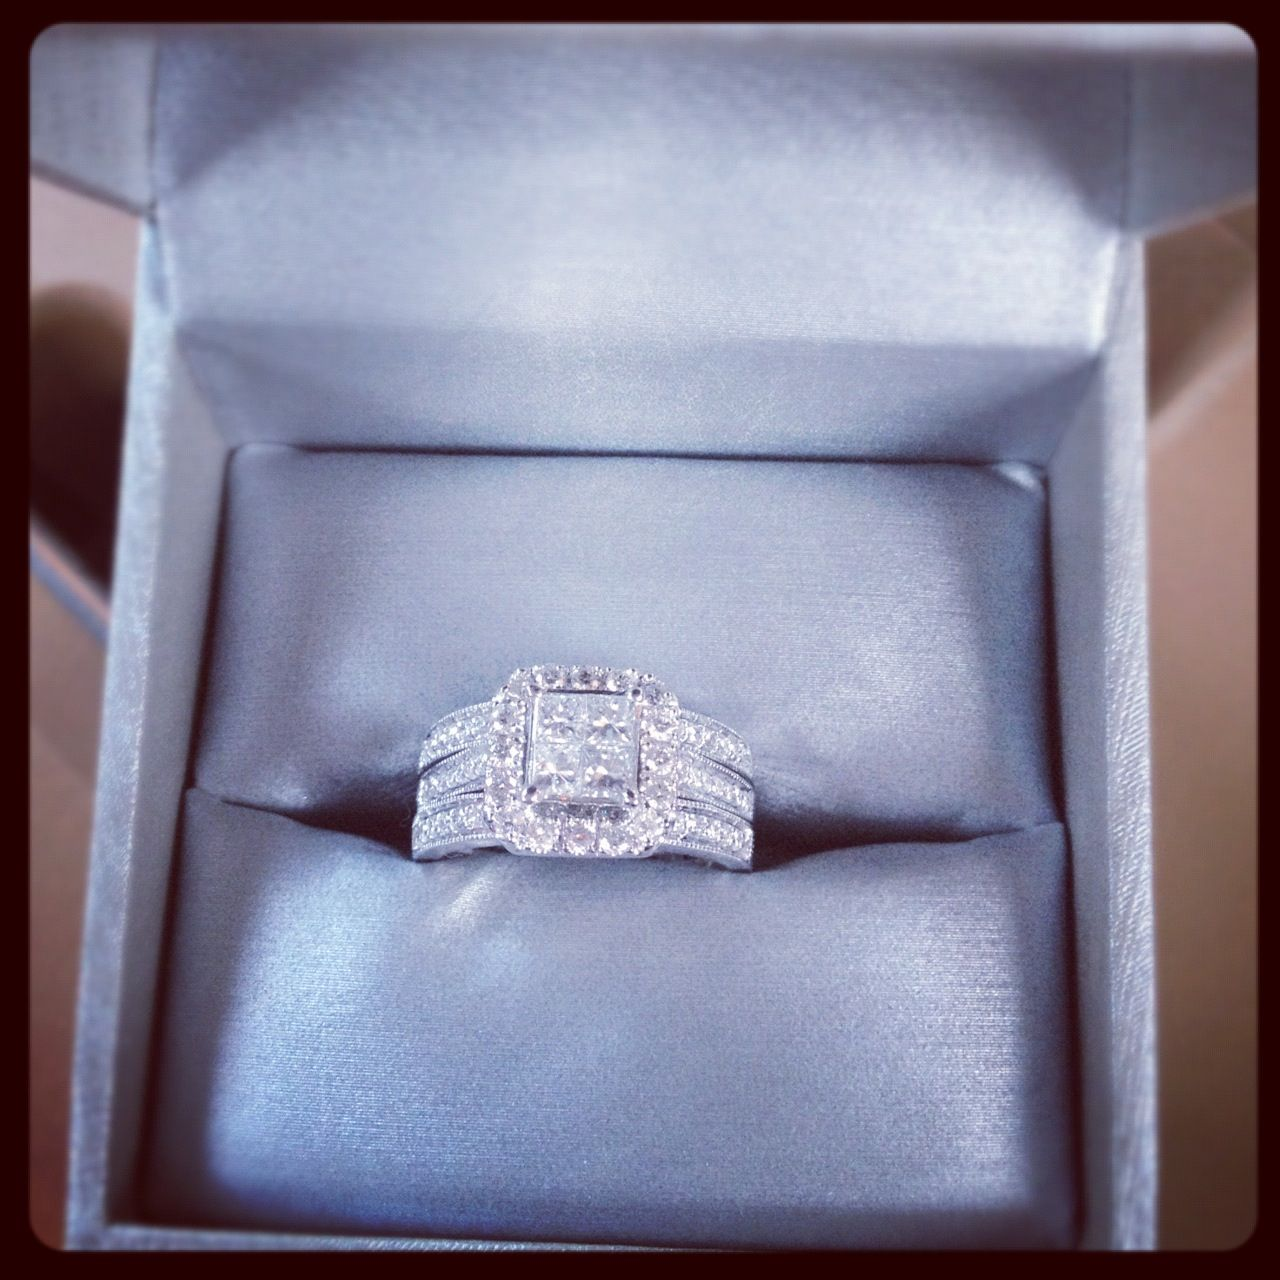 zales wedding rings sets Zales Bridal Set Engagement Ring 2 Wedding Bands My DREAM